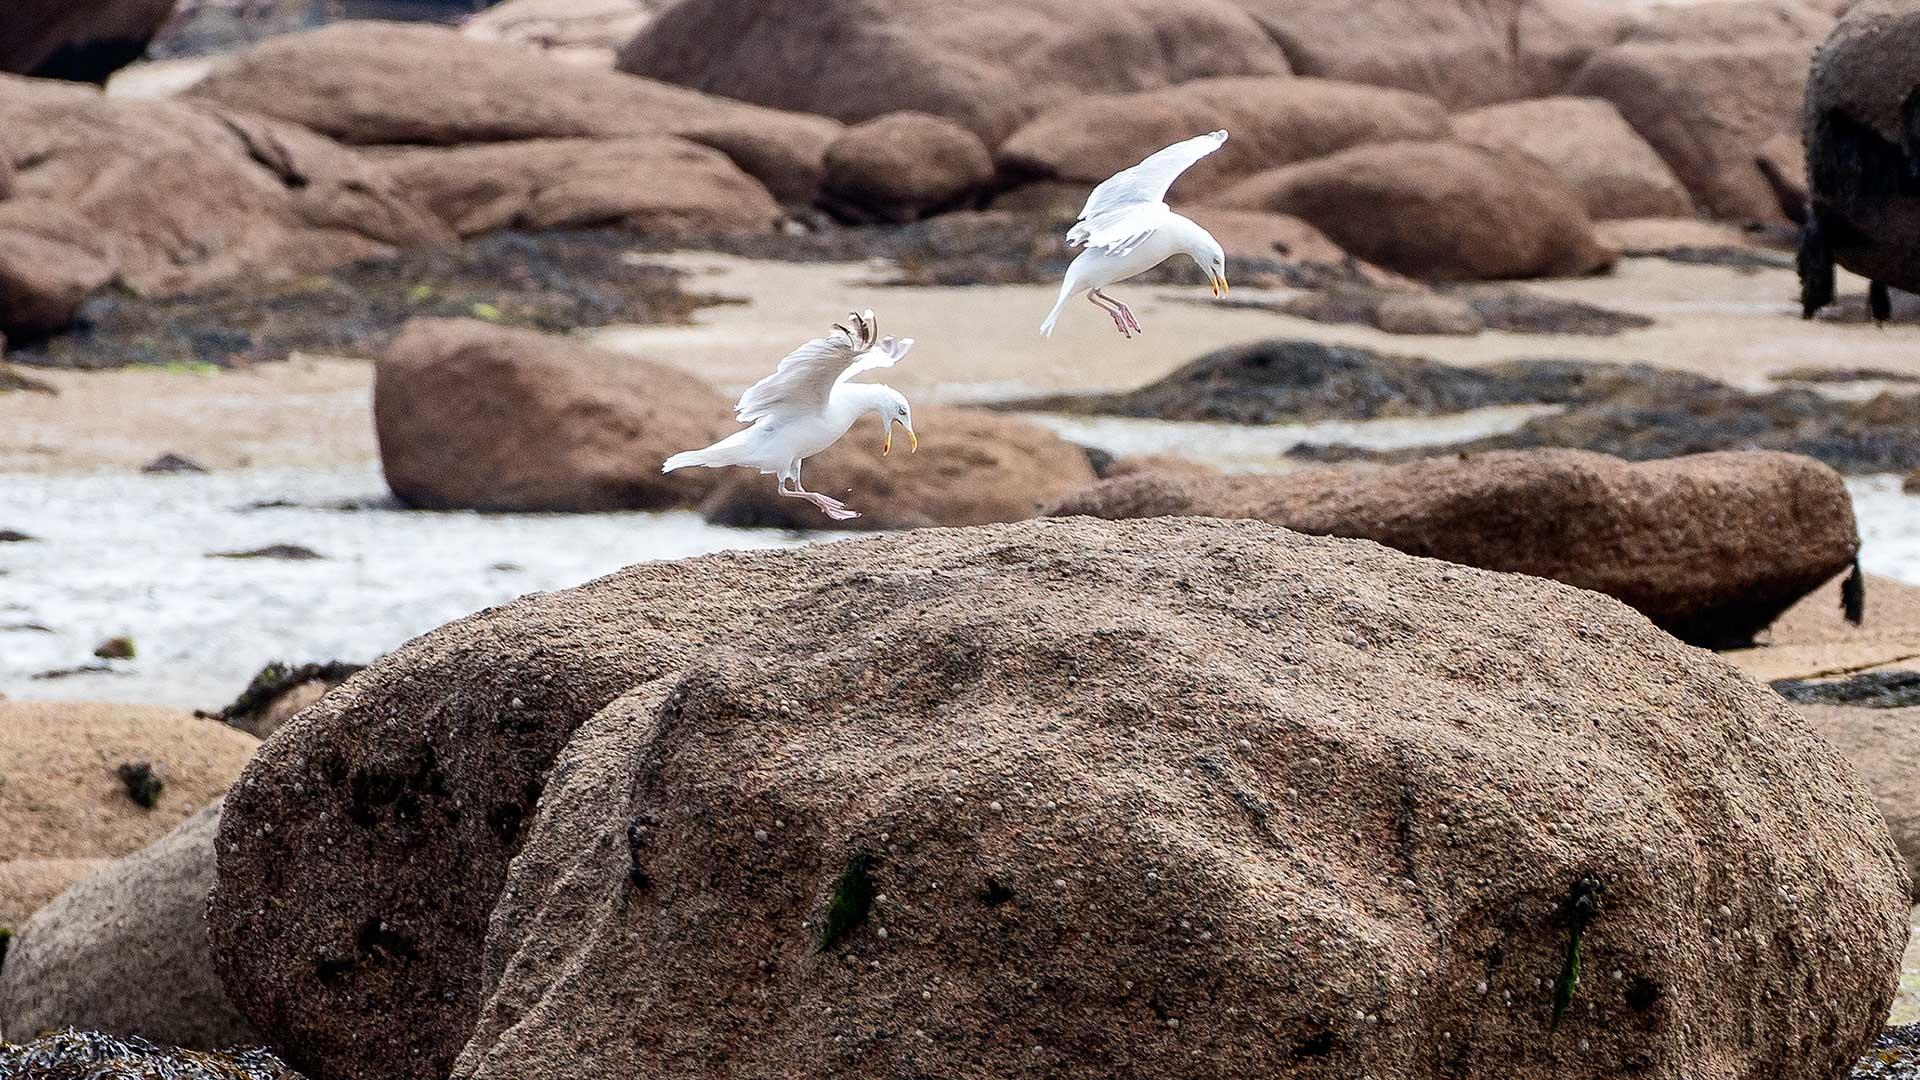 Naturfotografie, Tierfotografie: Côte de Granit Rose – Tanz der Möwen | Foto: Dieter Eikenberg, imprints